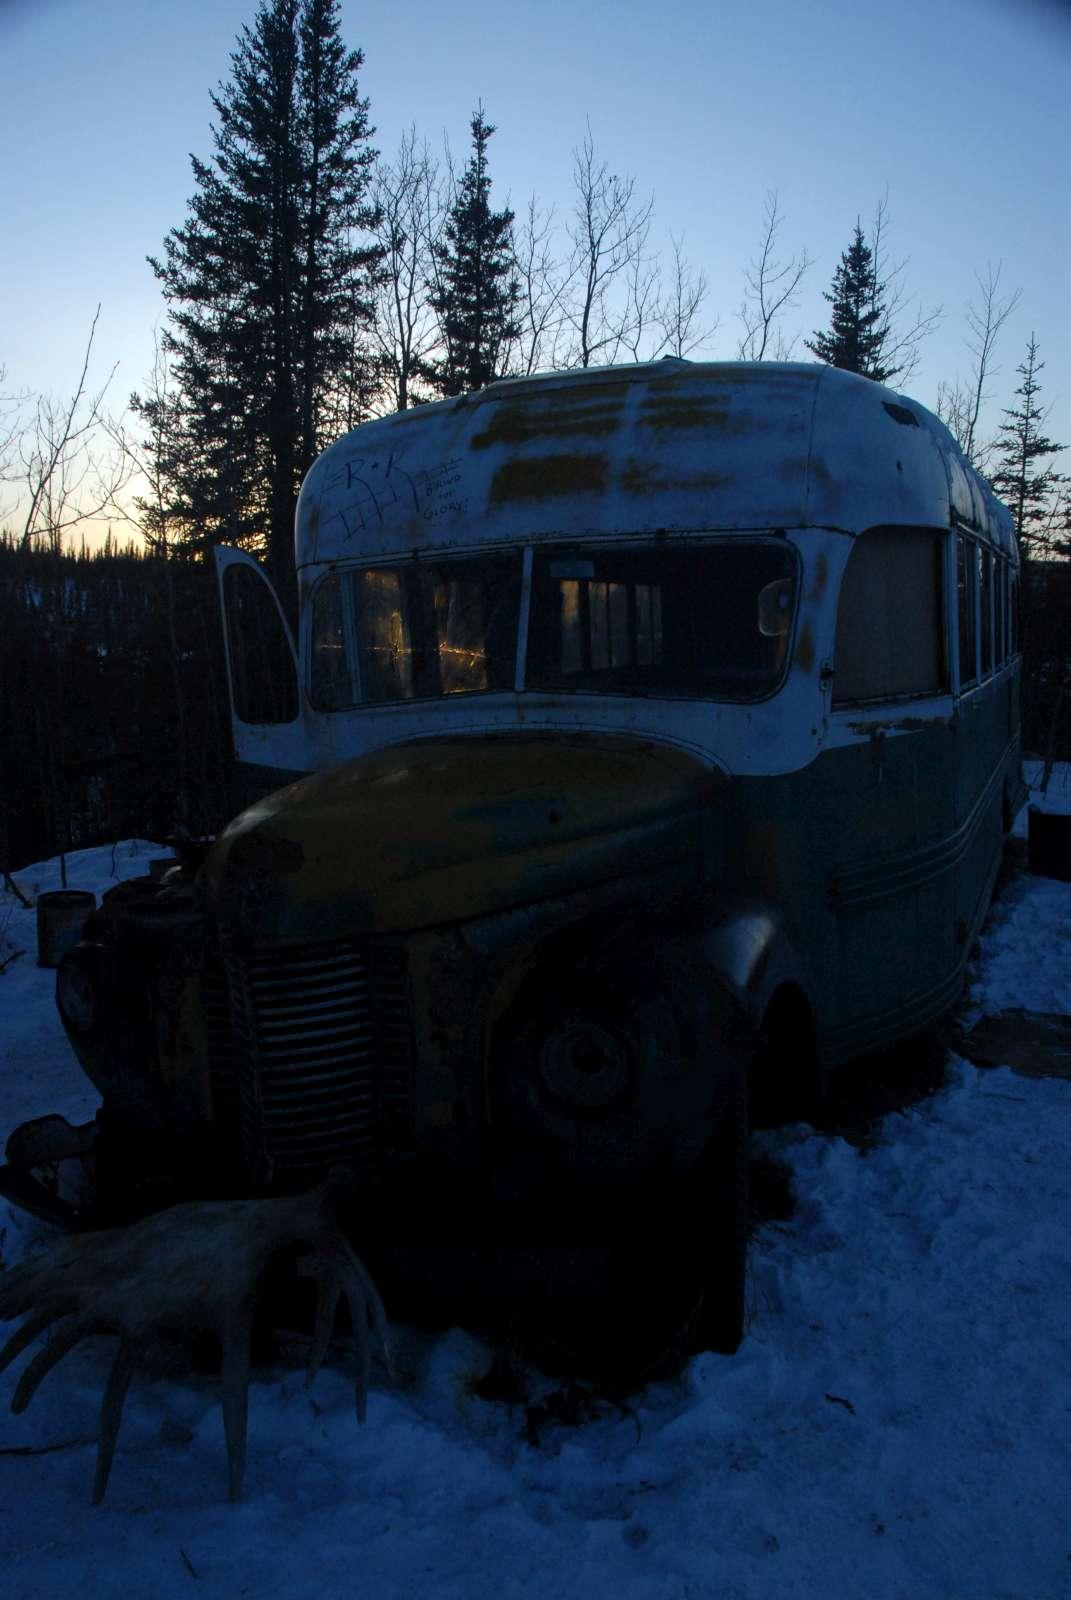 Finding Into the Wild's Magic Bus – freewheelings.com